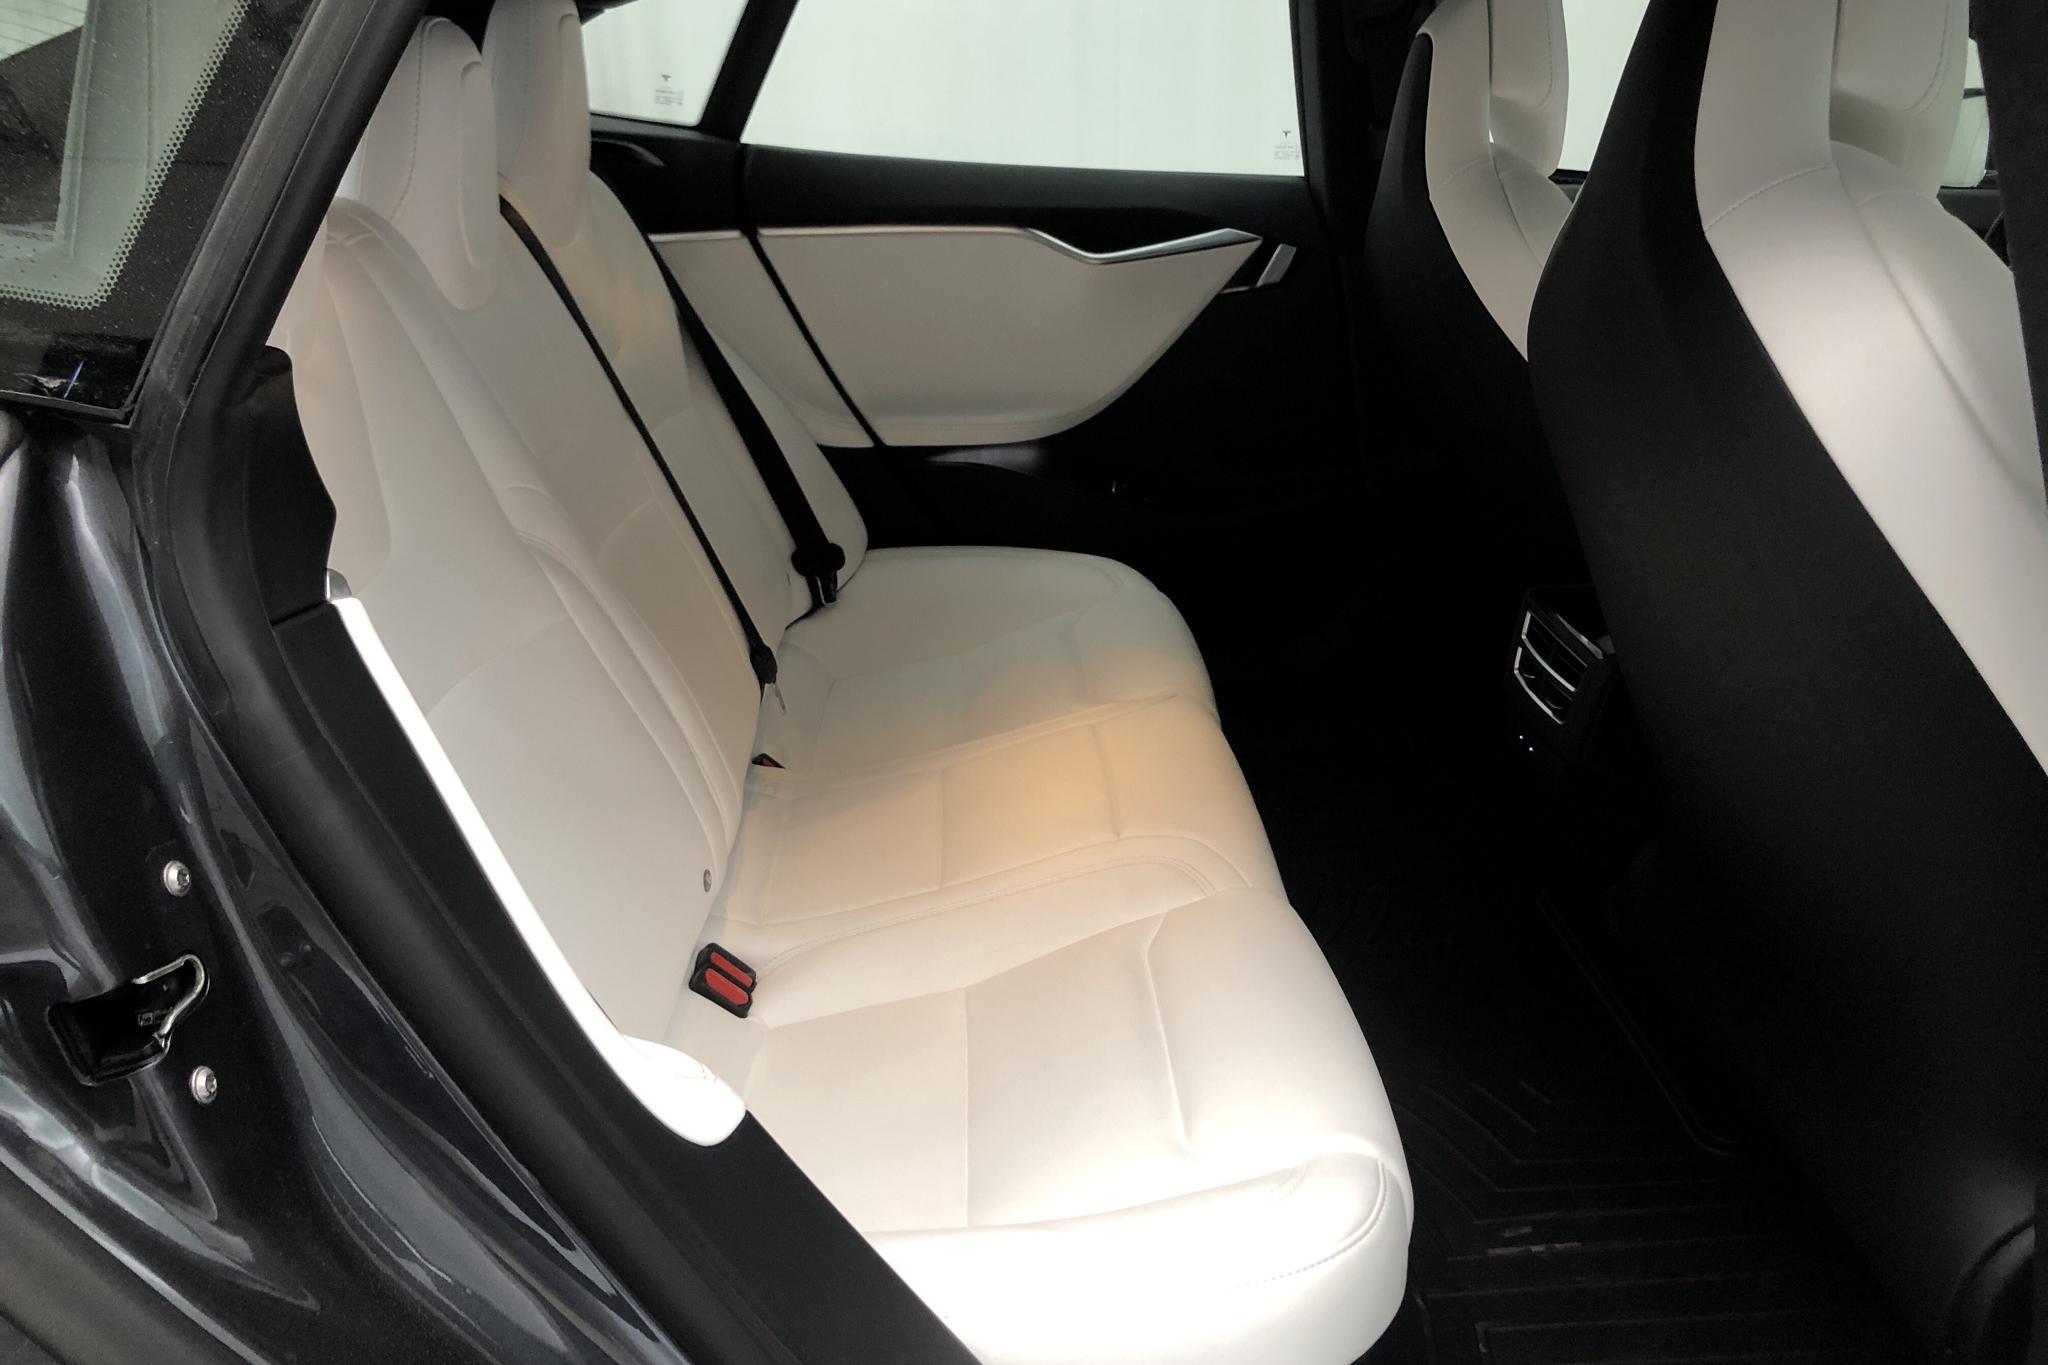 Tesla Model S 100D - 106 100 km - Automatic - gray - 2017